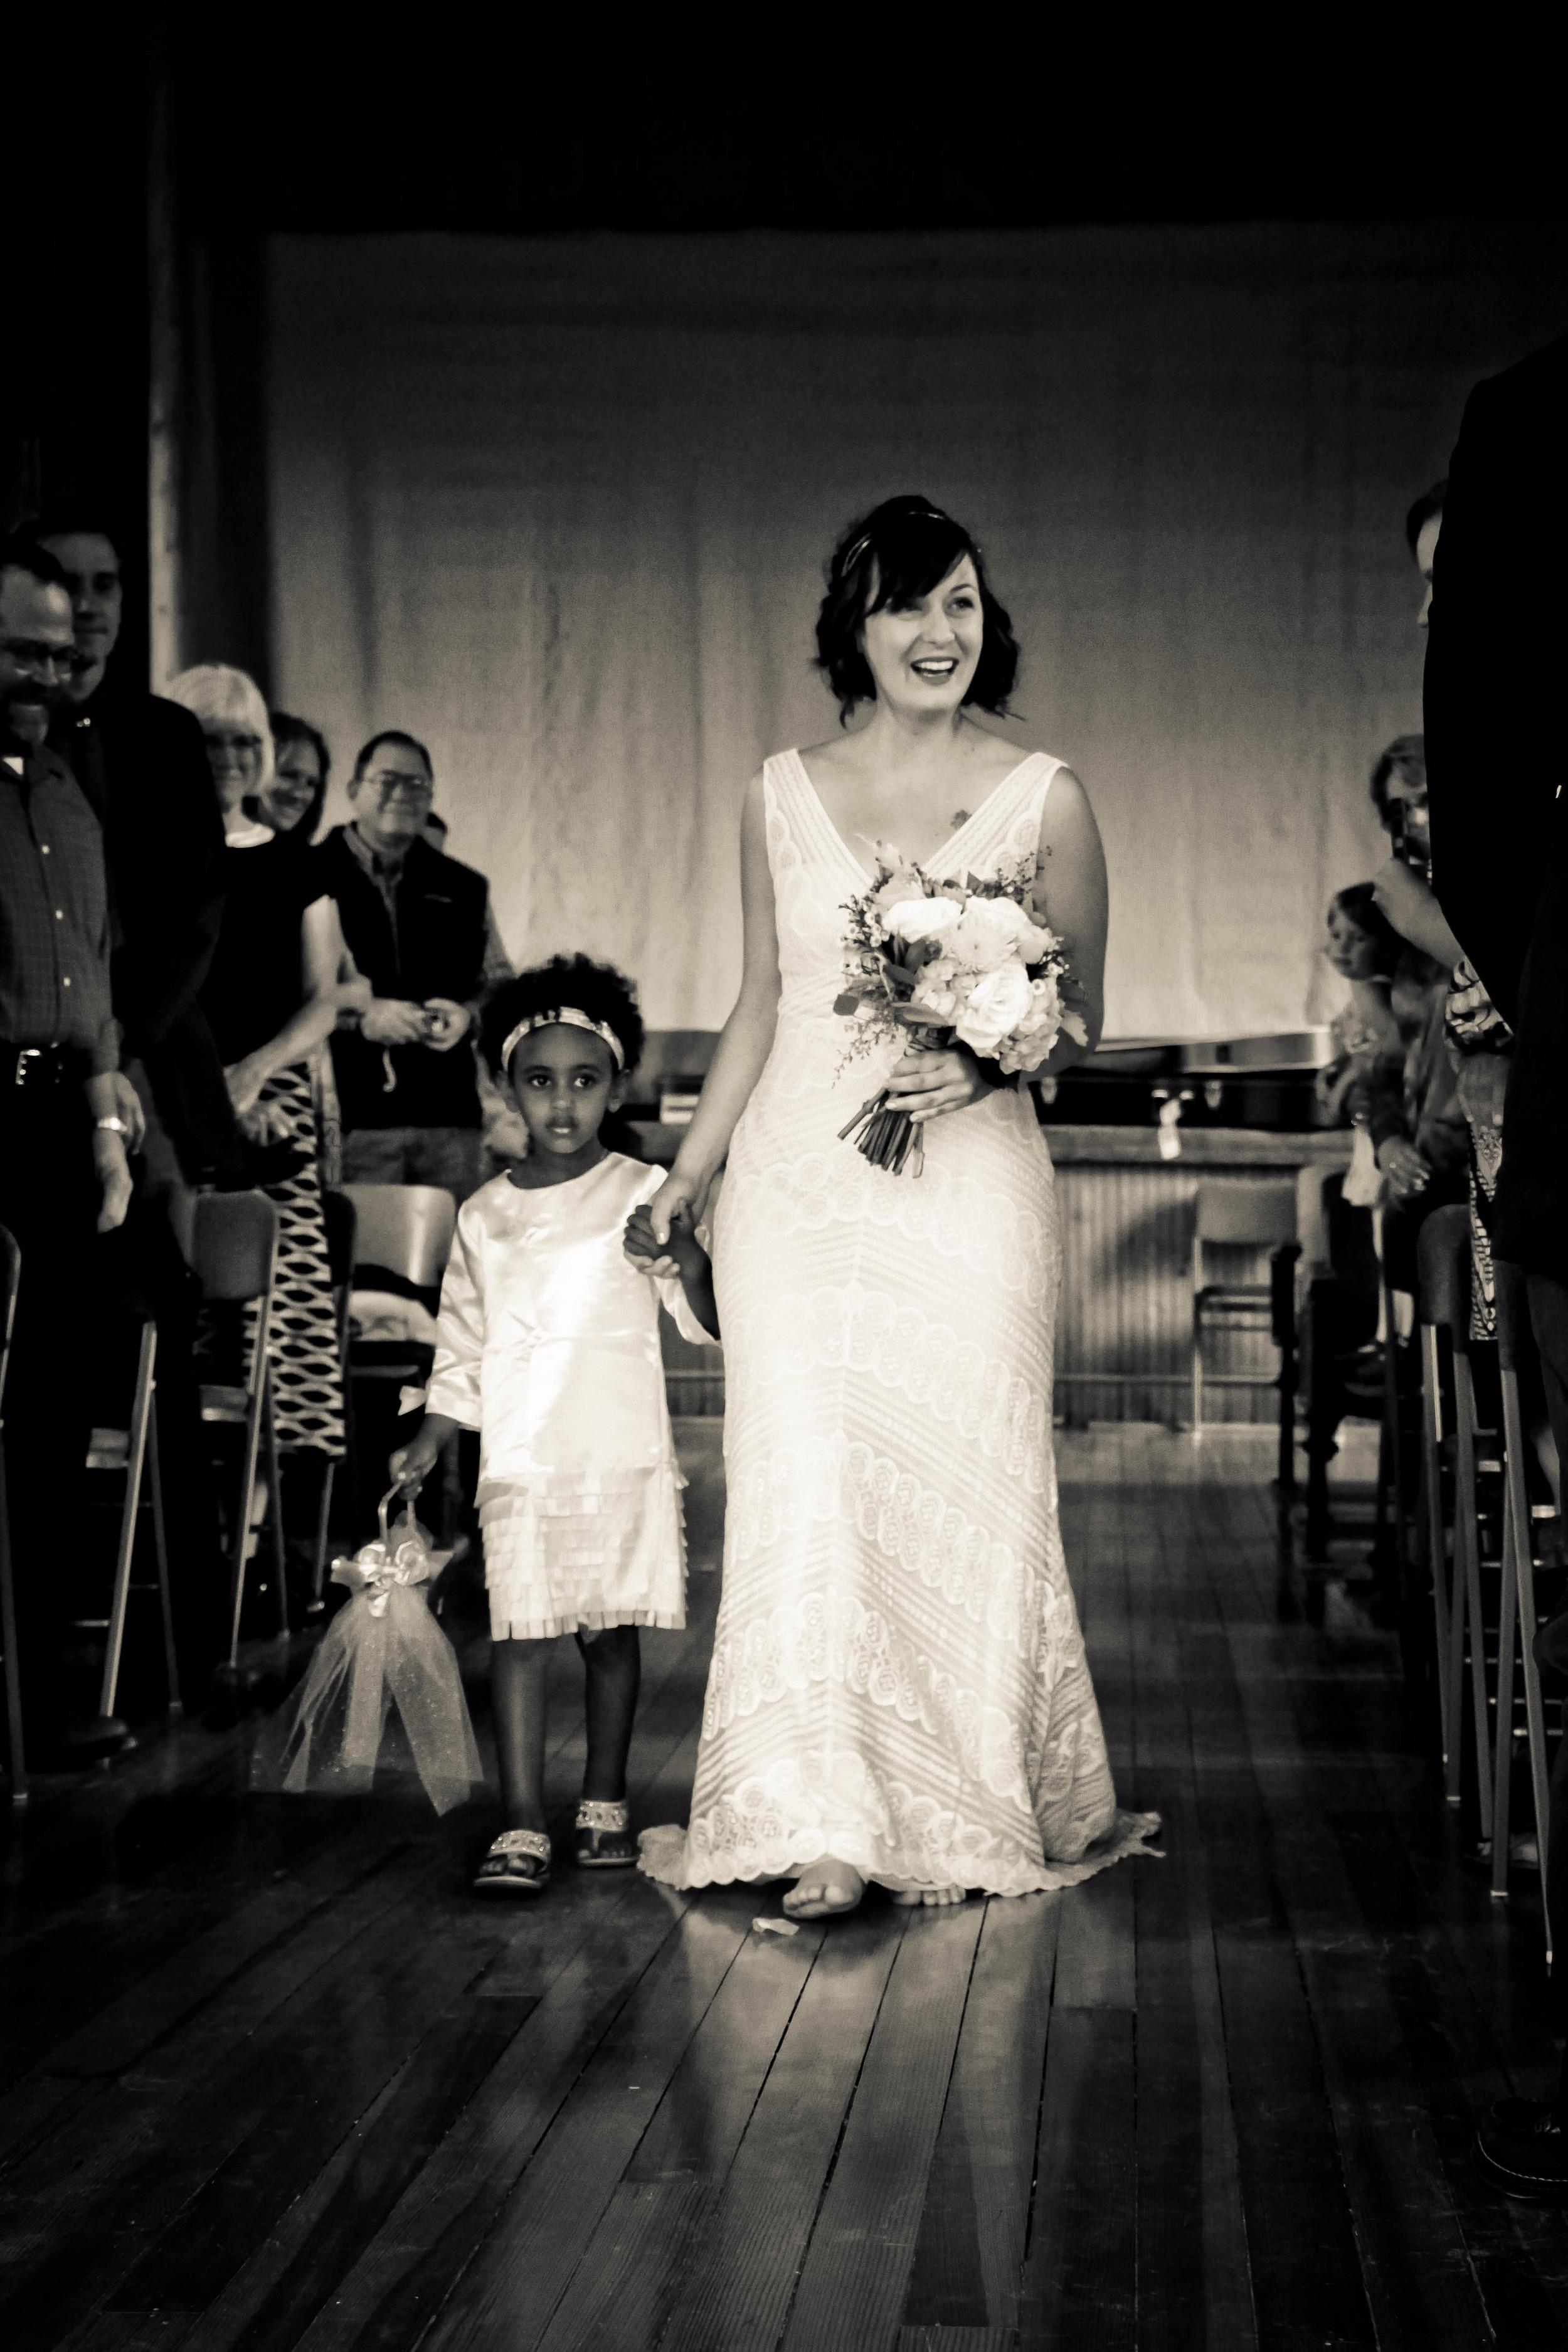 Kimberly_Eric_Mountain_Town_Wedding_2.jpg